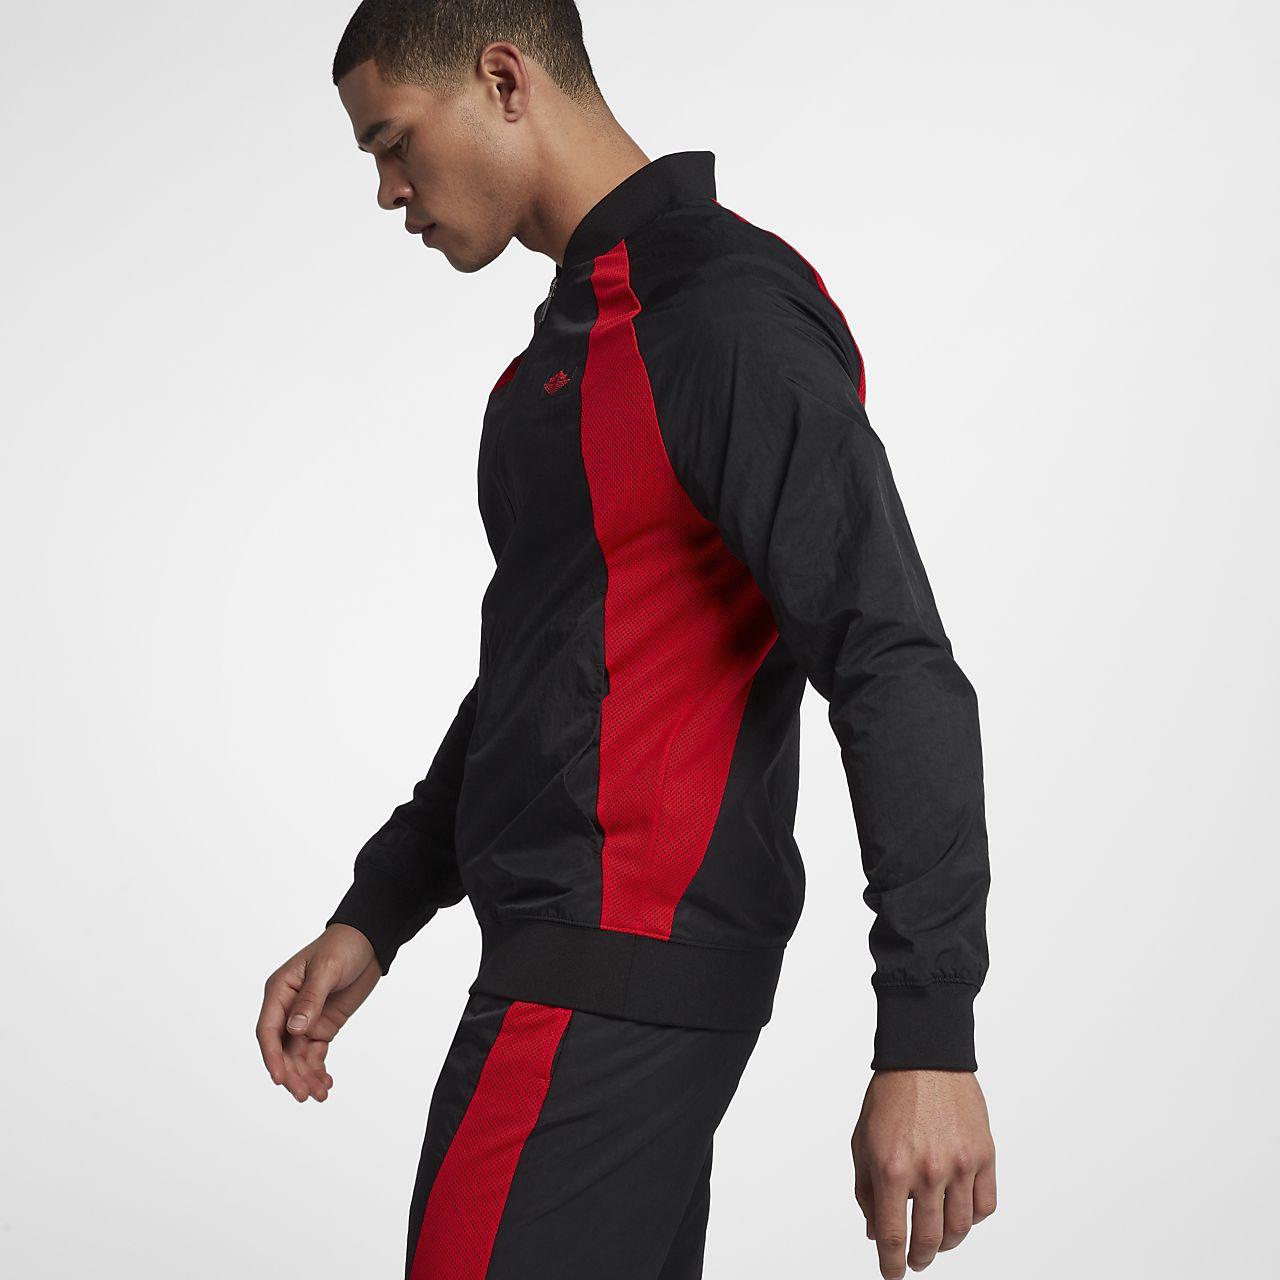 ... Air Jordan 1 Wings Men's Jacket